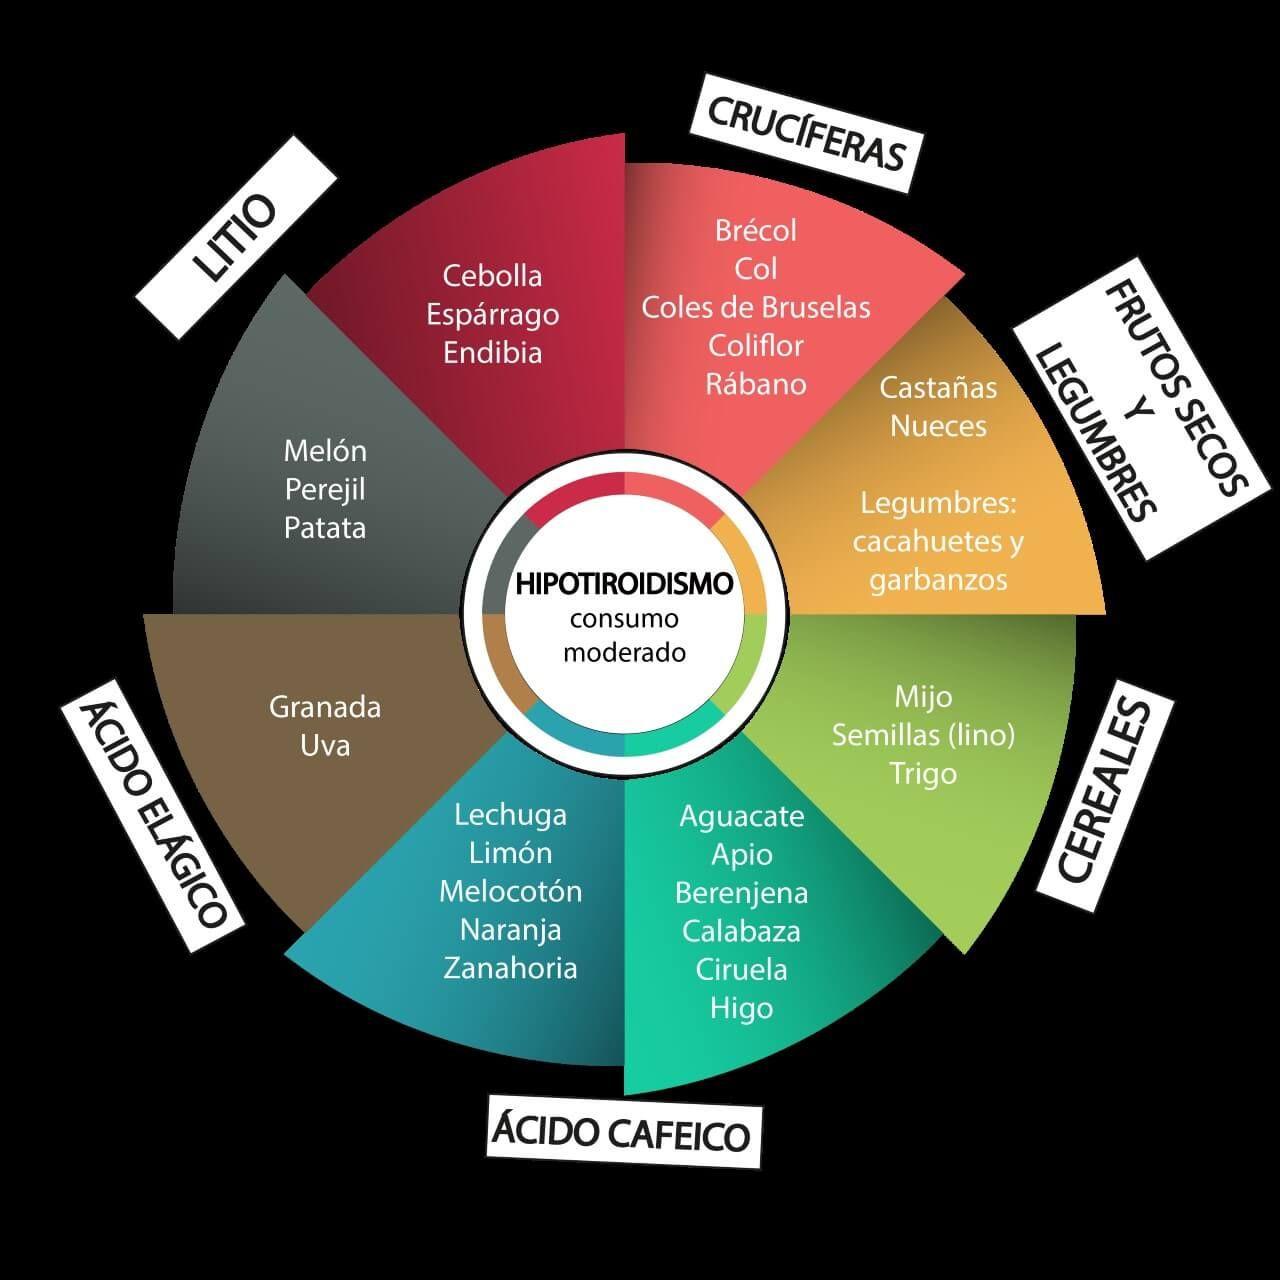 Dieta hipotiroidismo alimentos a evitar en hipotiroidismo hipotiroidismo pinterest - Alimentos prohibidos con hemorroides ...